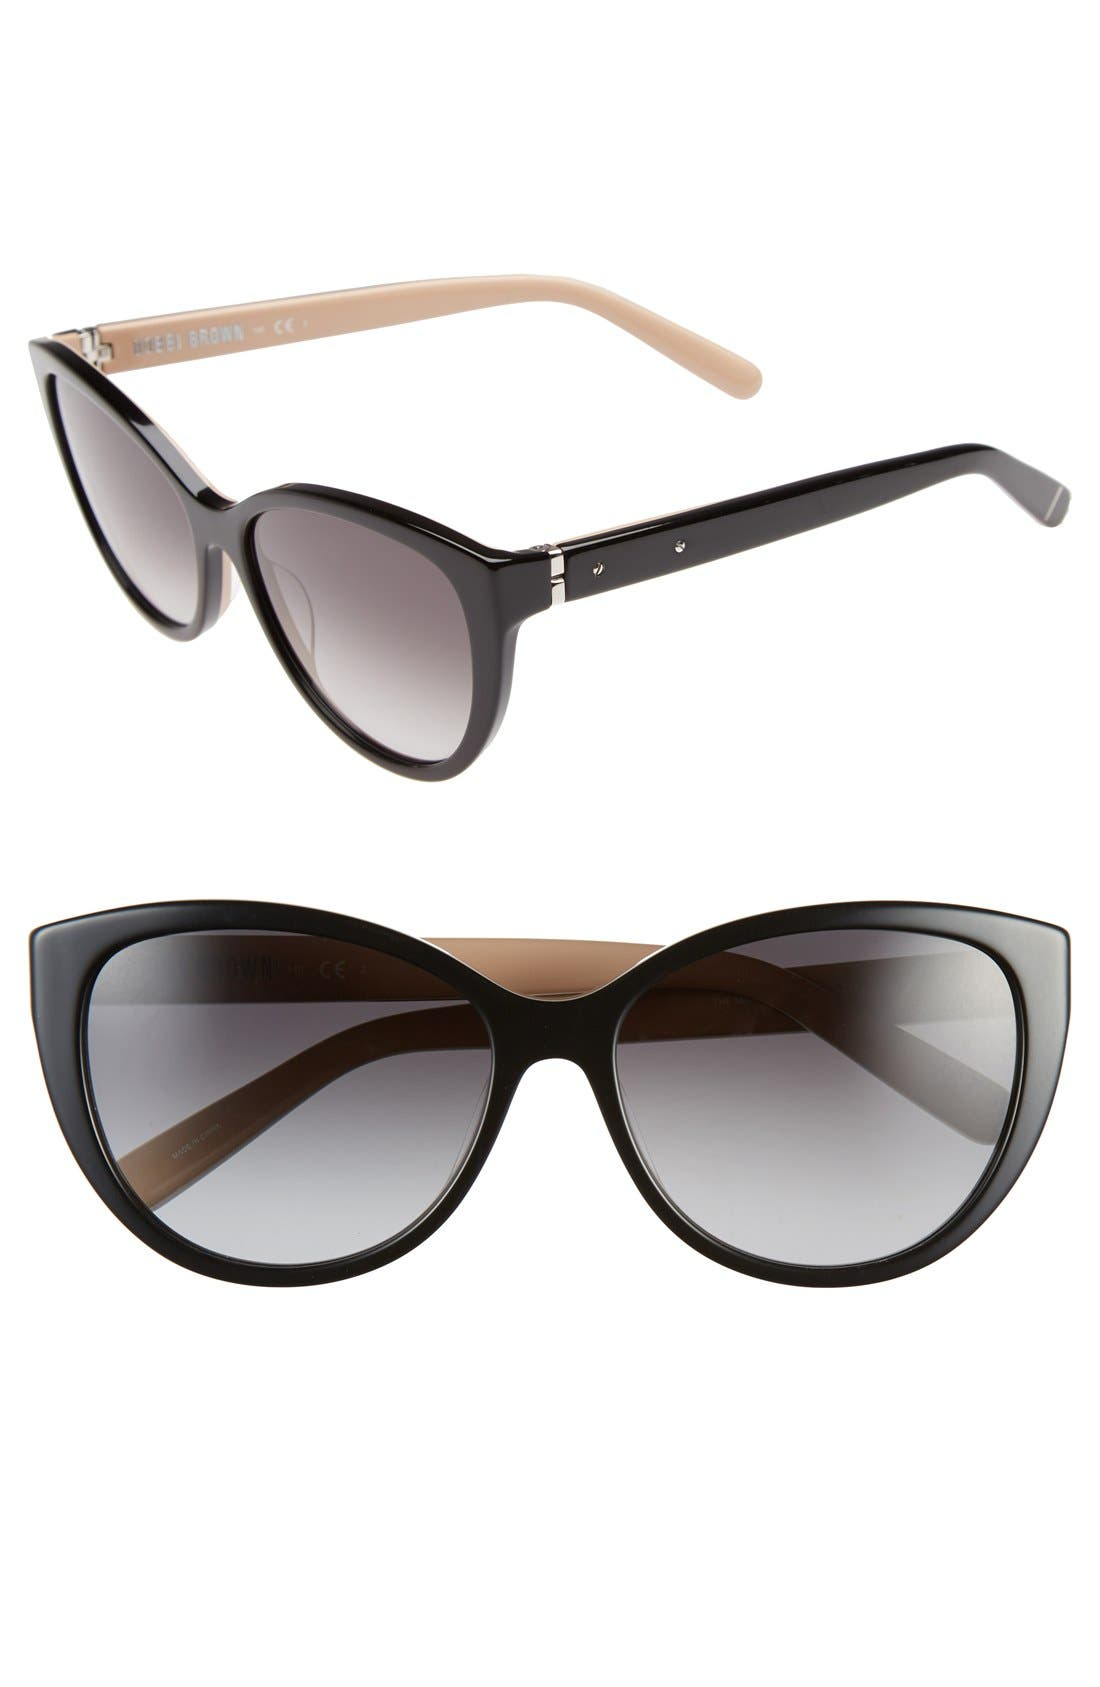 Bobbi Brown 'The Marylins' 56mm Cat Eye Sunglasses